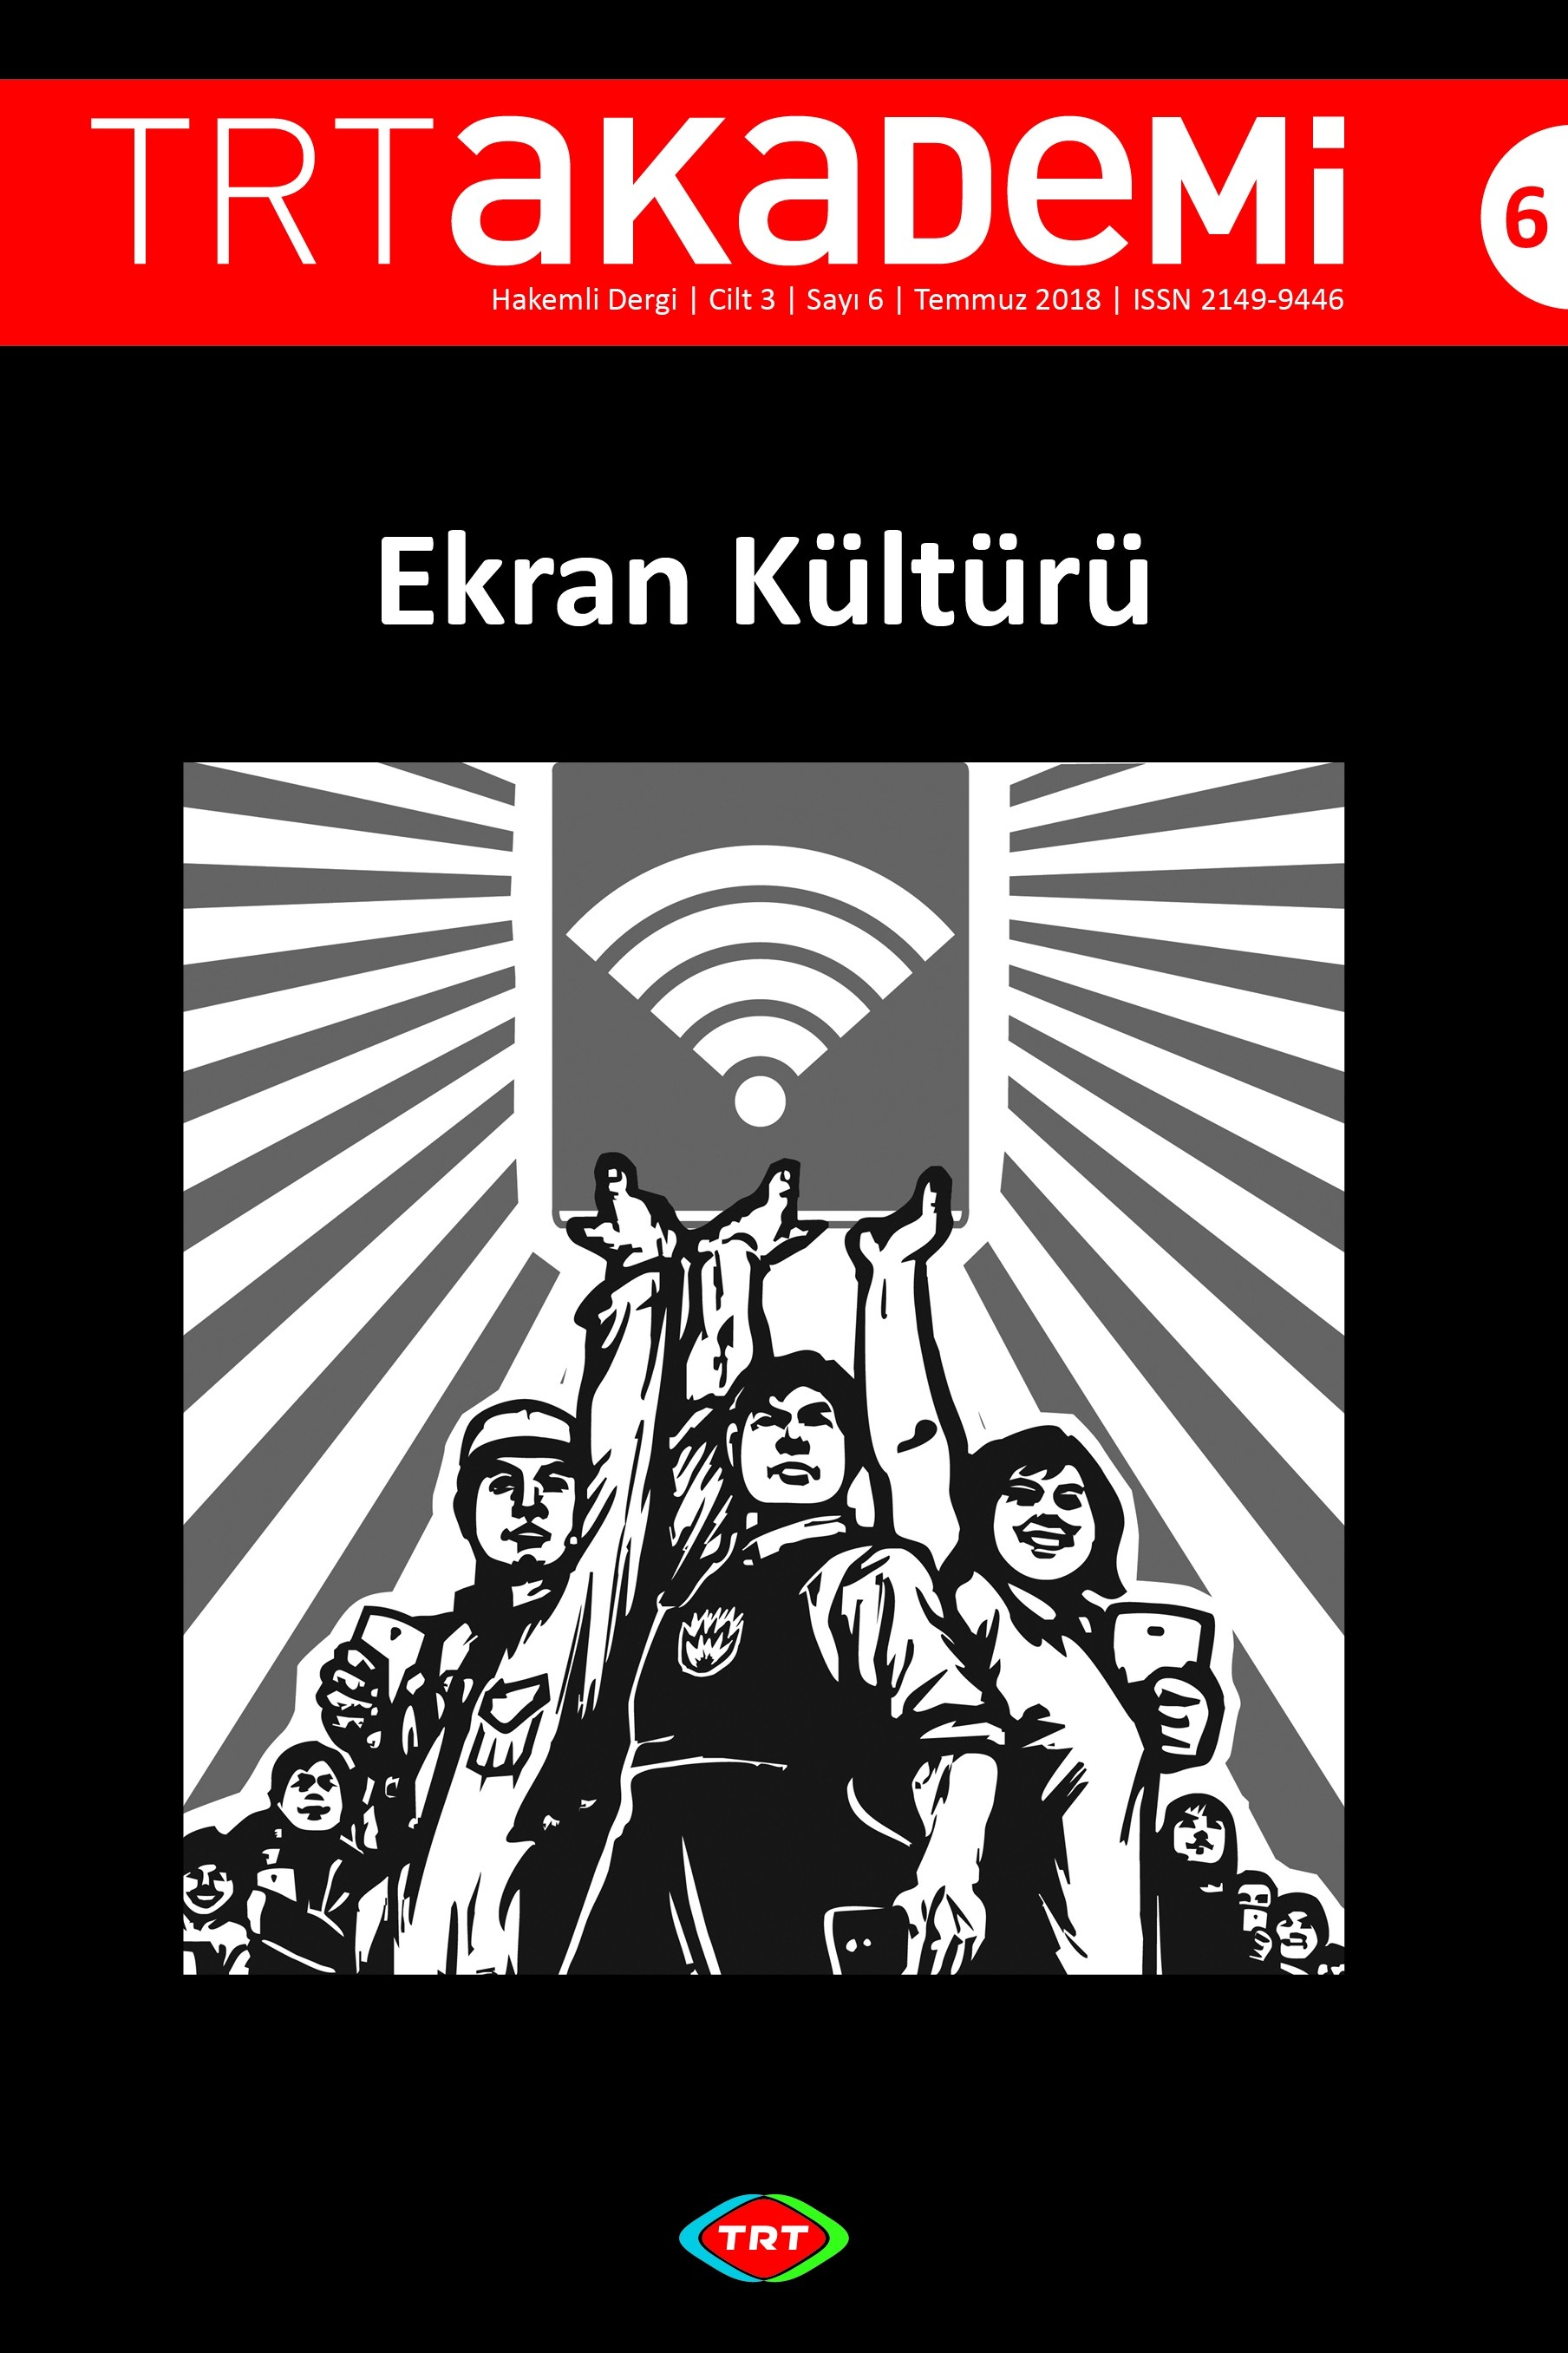 TRT Akademi